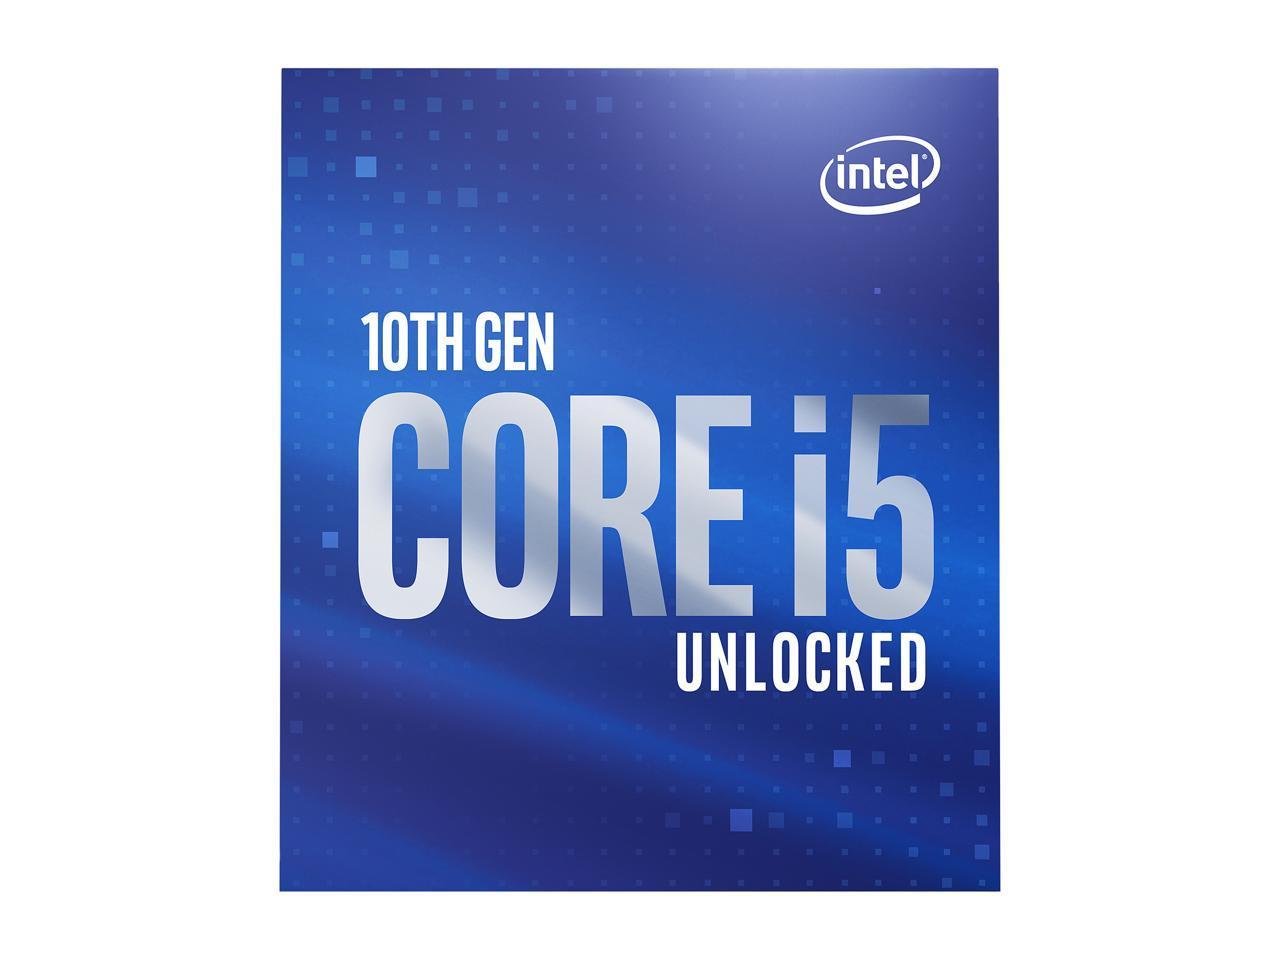 Intel Core i5-10600K, 6-Core, 4.1 GHz, Intel UHD Graphics 630 & Gaming Bundle $178.99